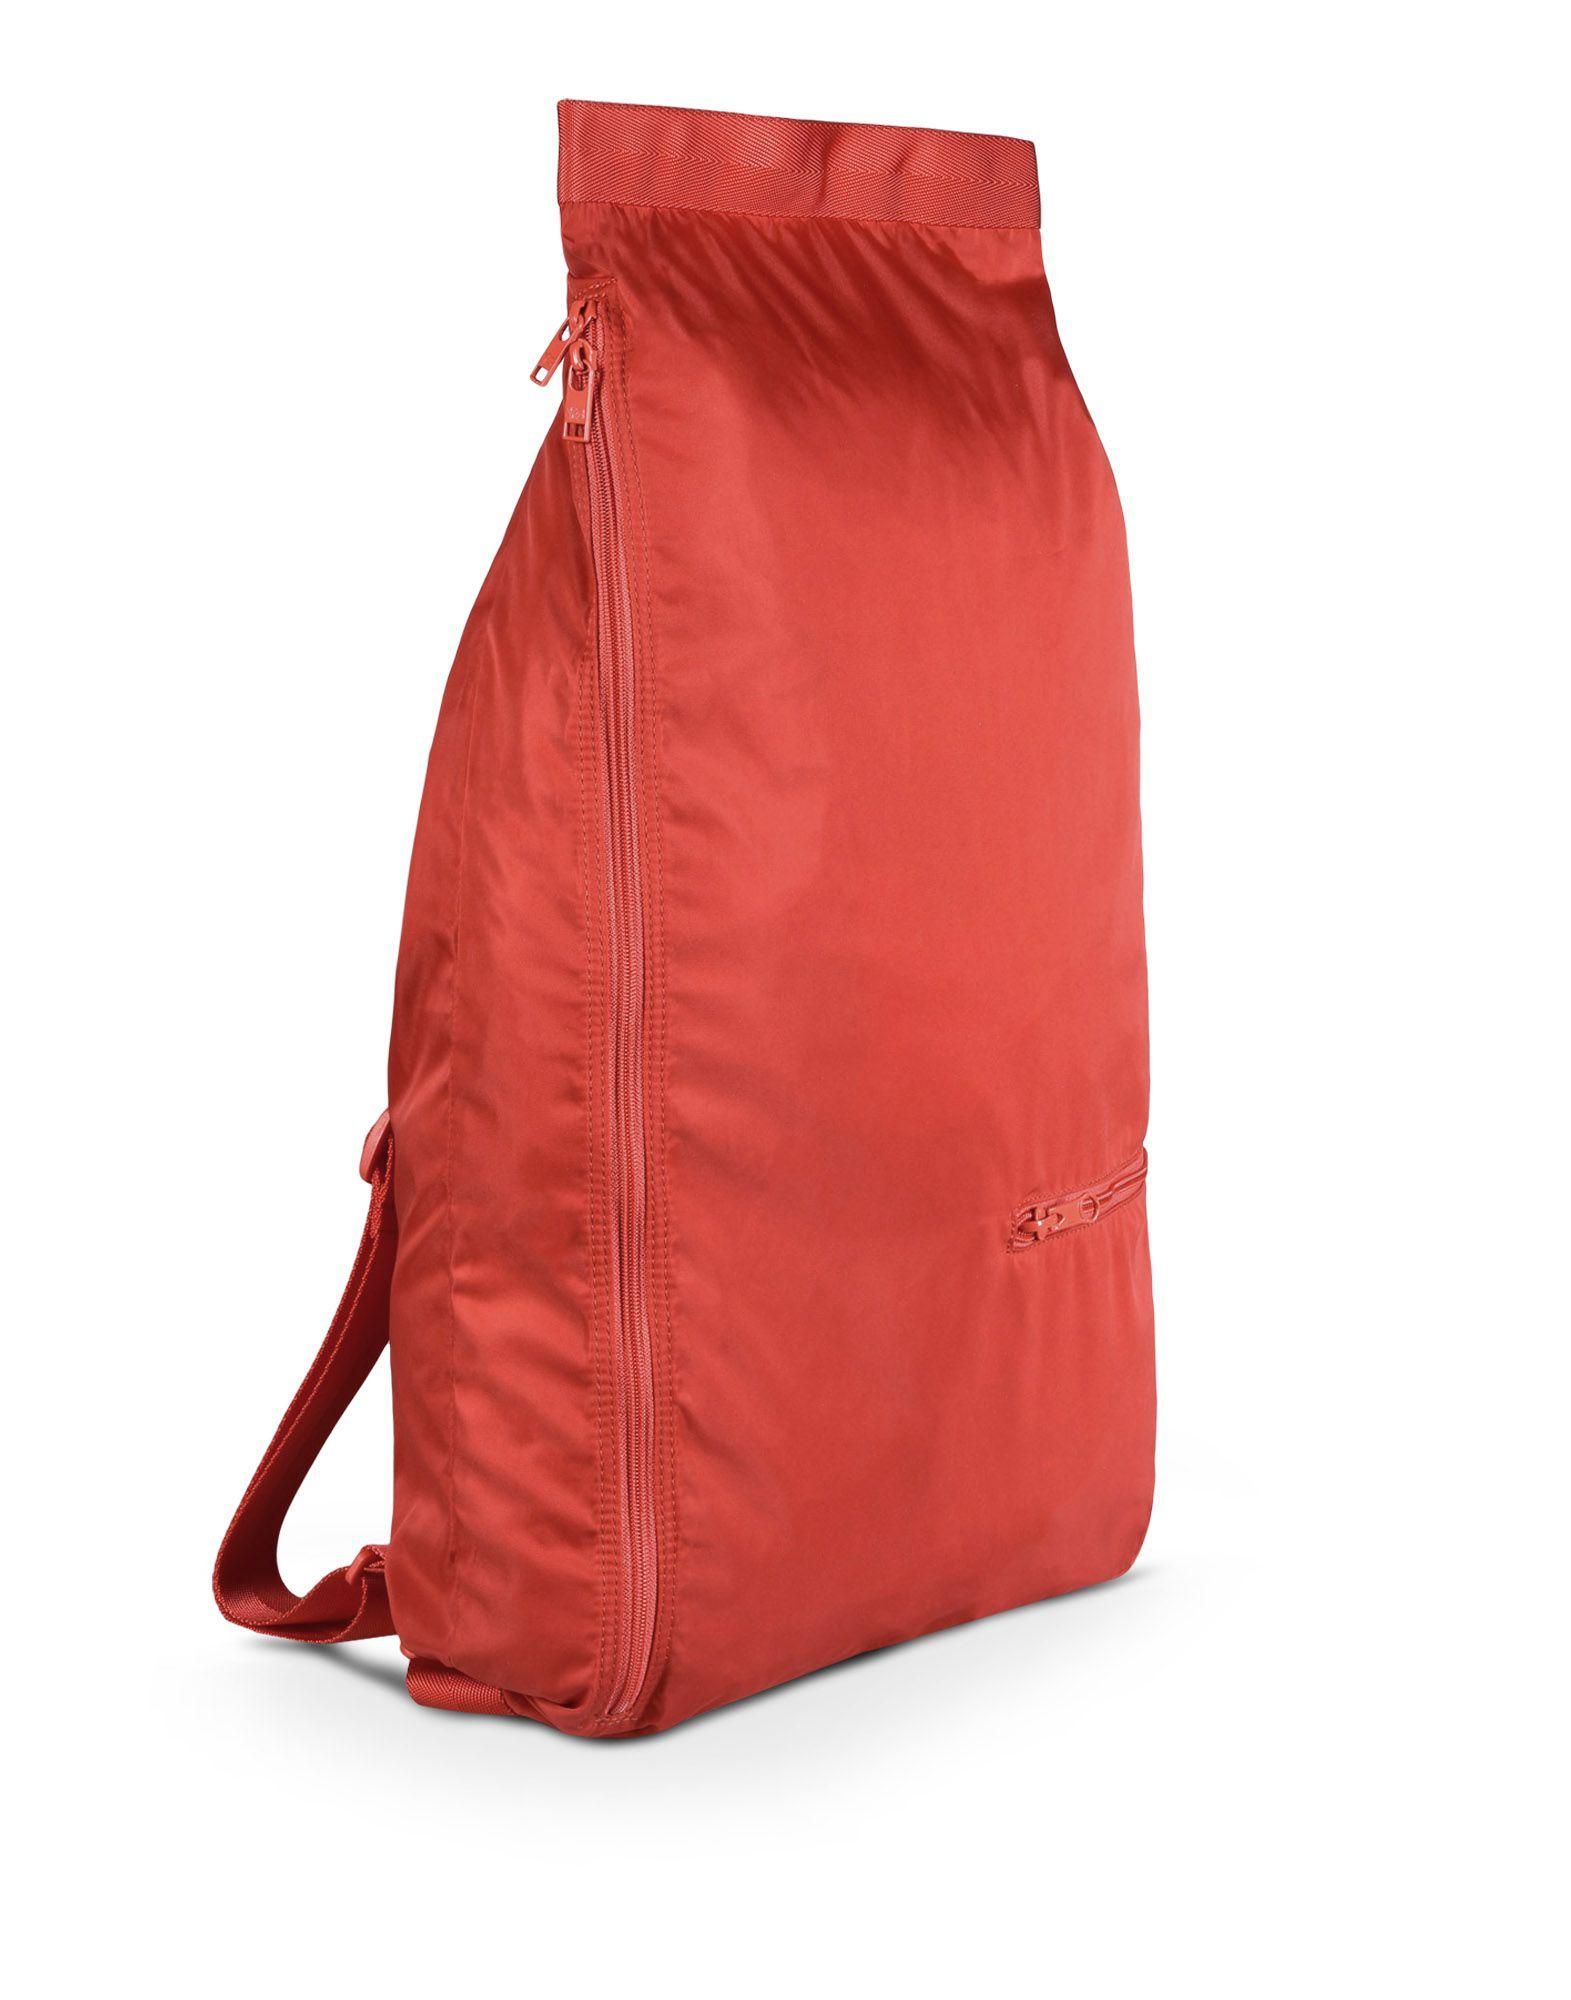 Y-3 PACKABLE BAG BAGS unisex Y-3 adidas  ca519493bc053